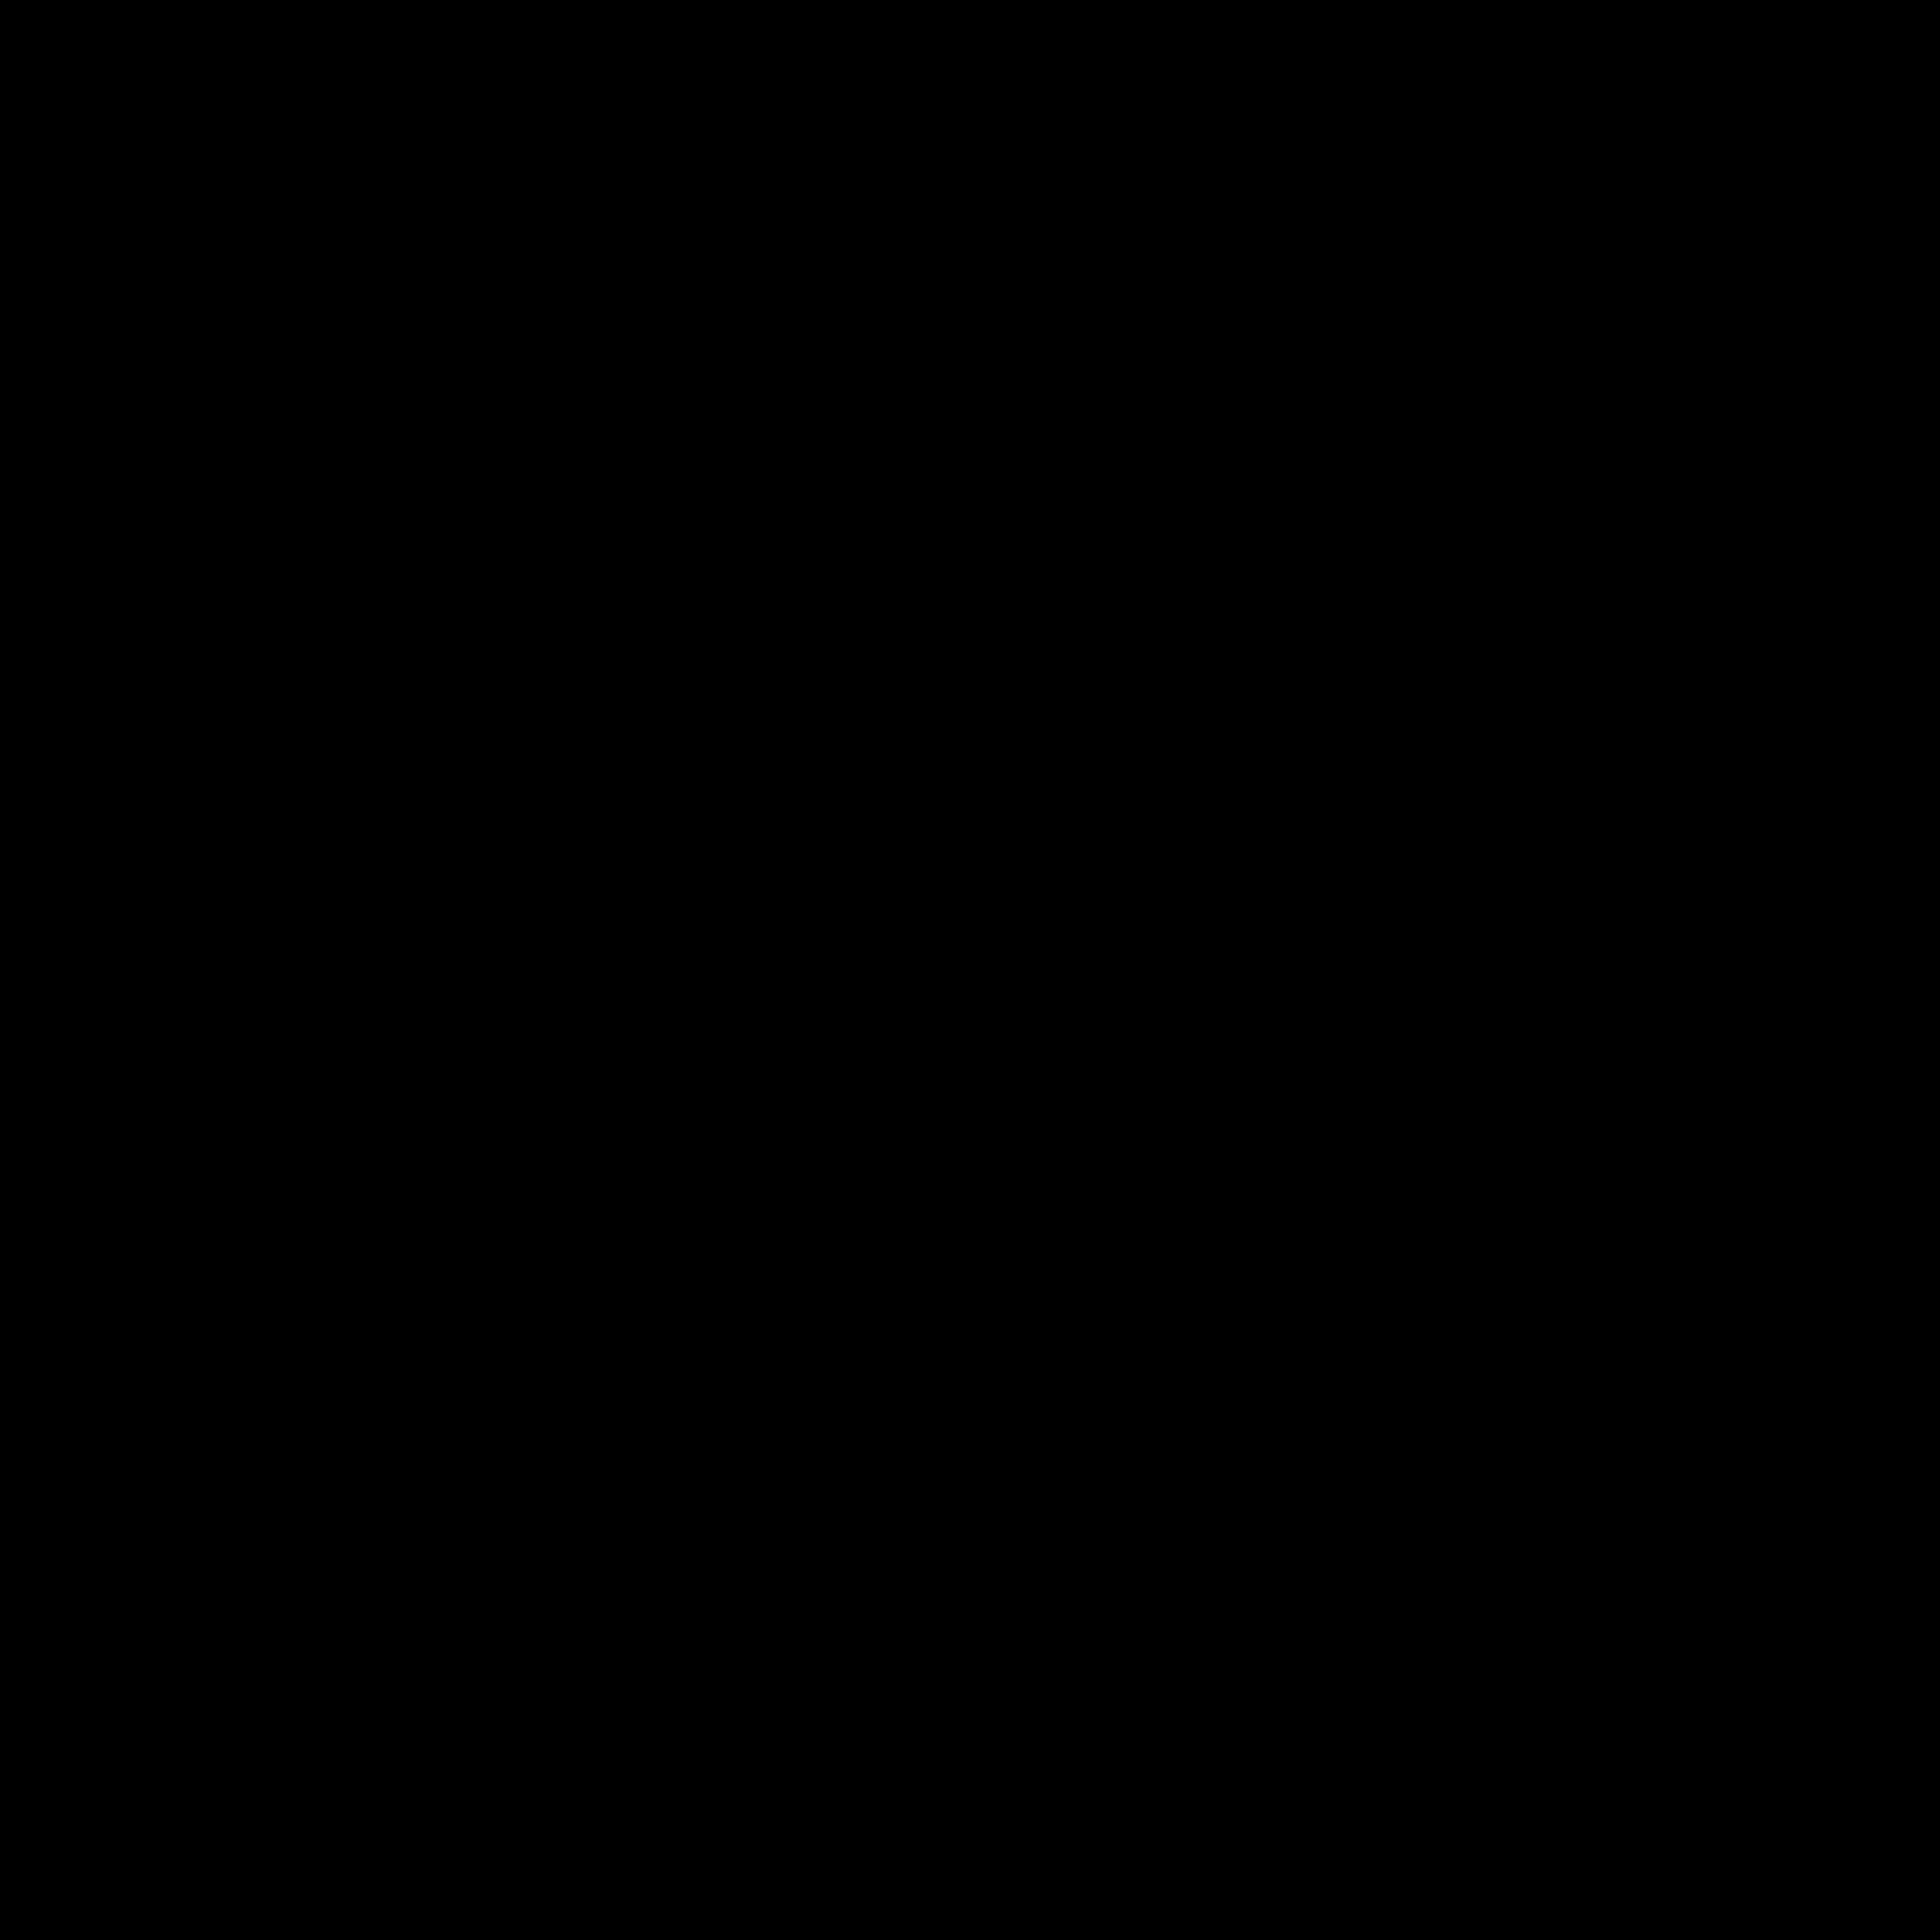 woman silhouette 41